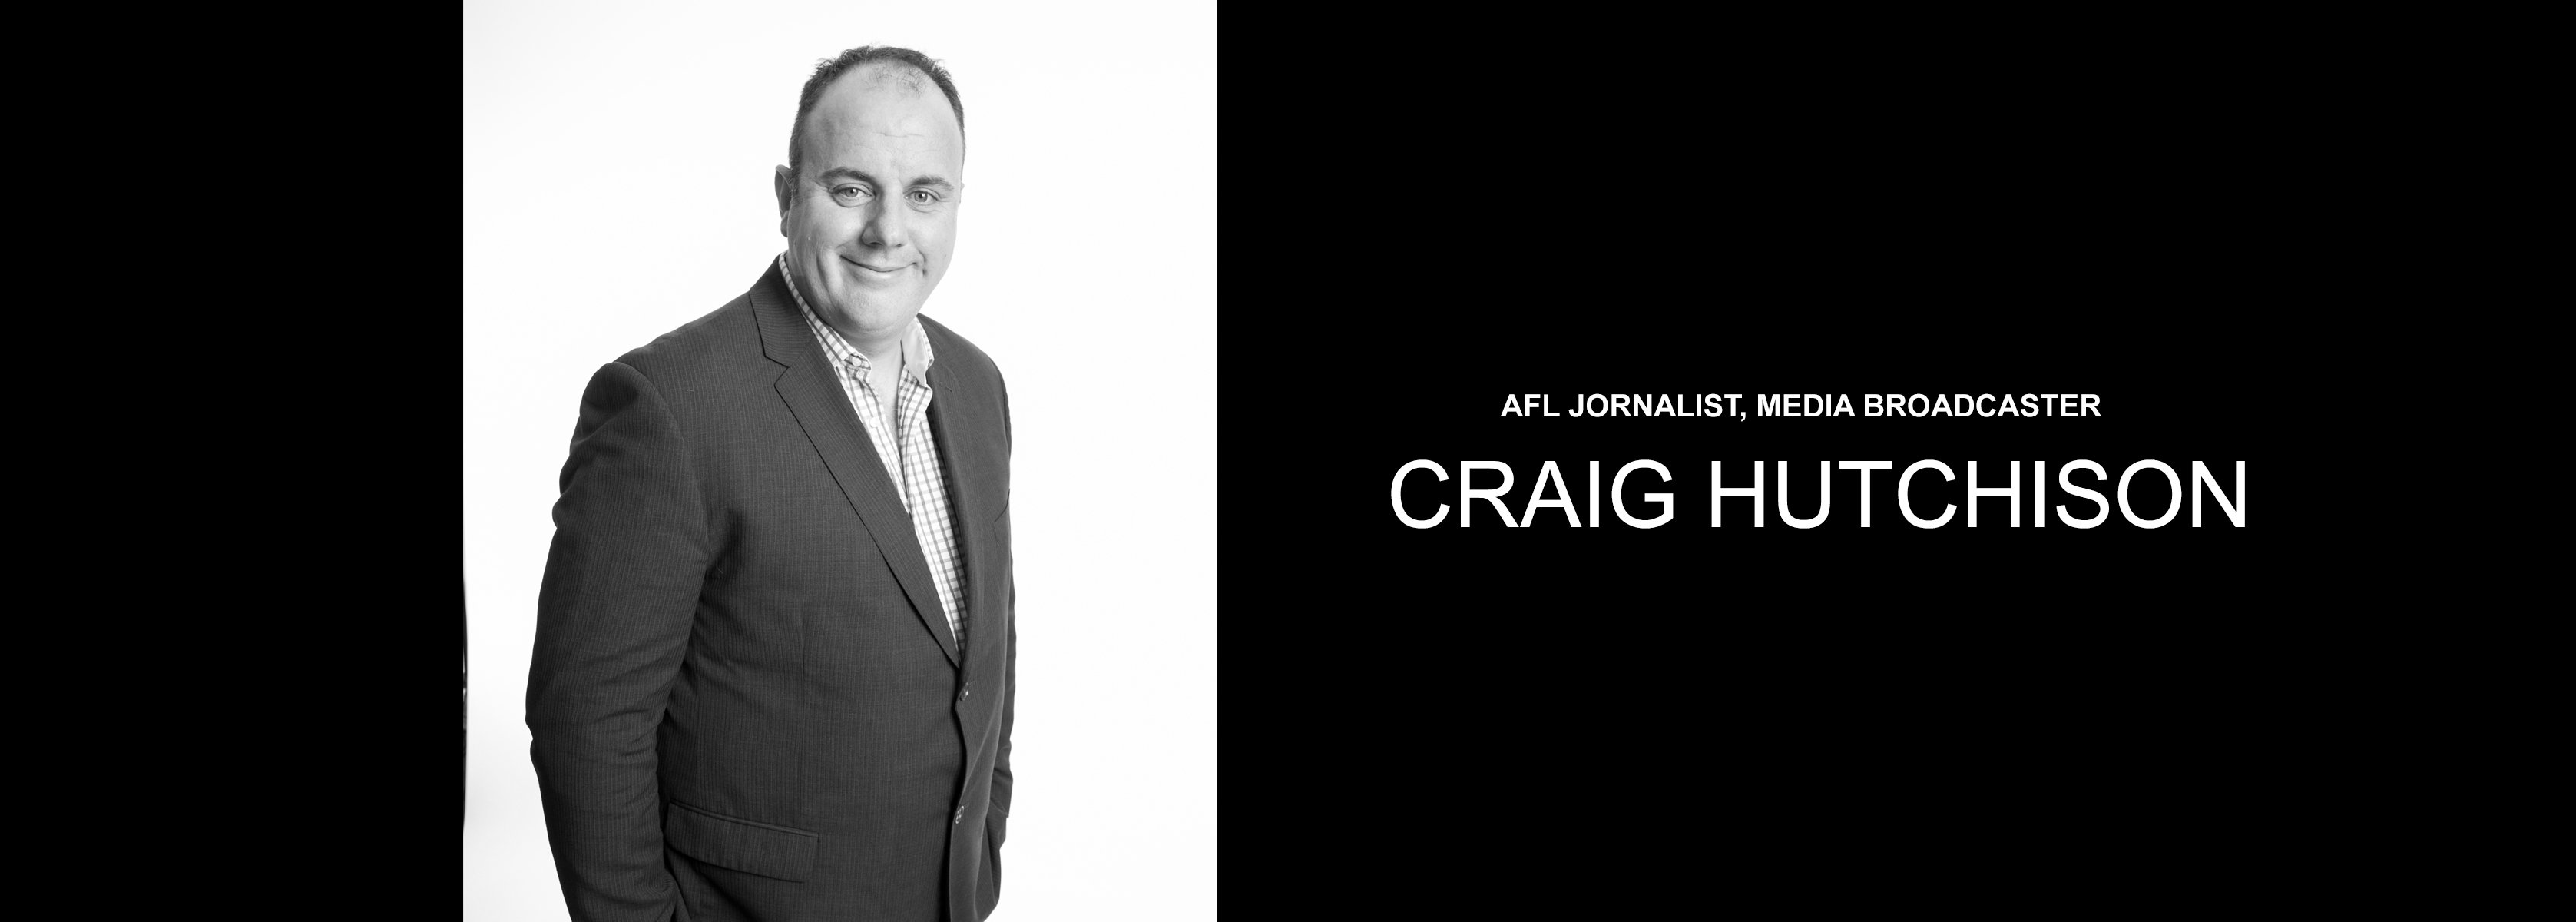 Craig Hutchison - AFL Journalist, Media Broadcaster - Bravo Talent Management